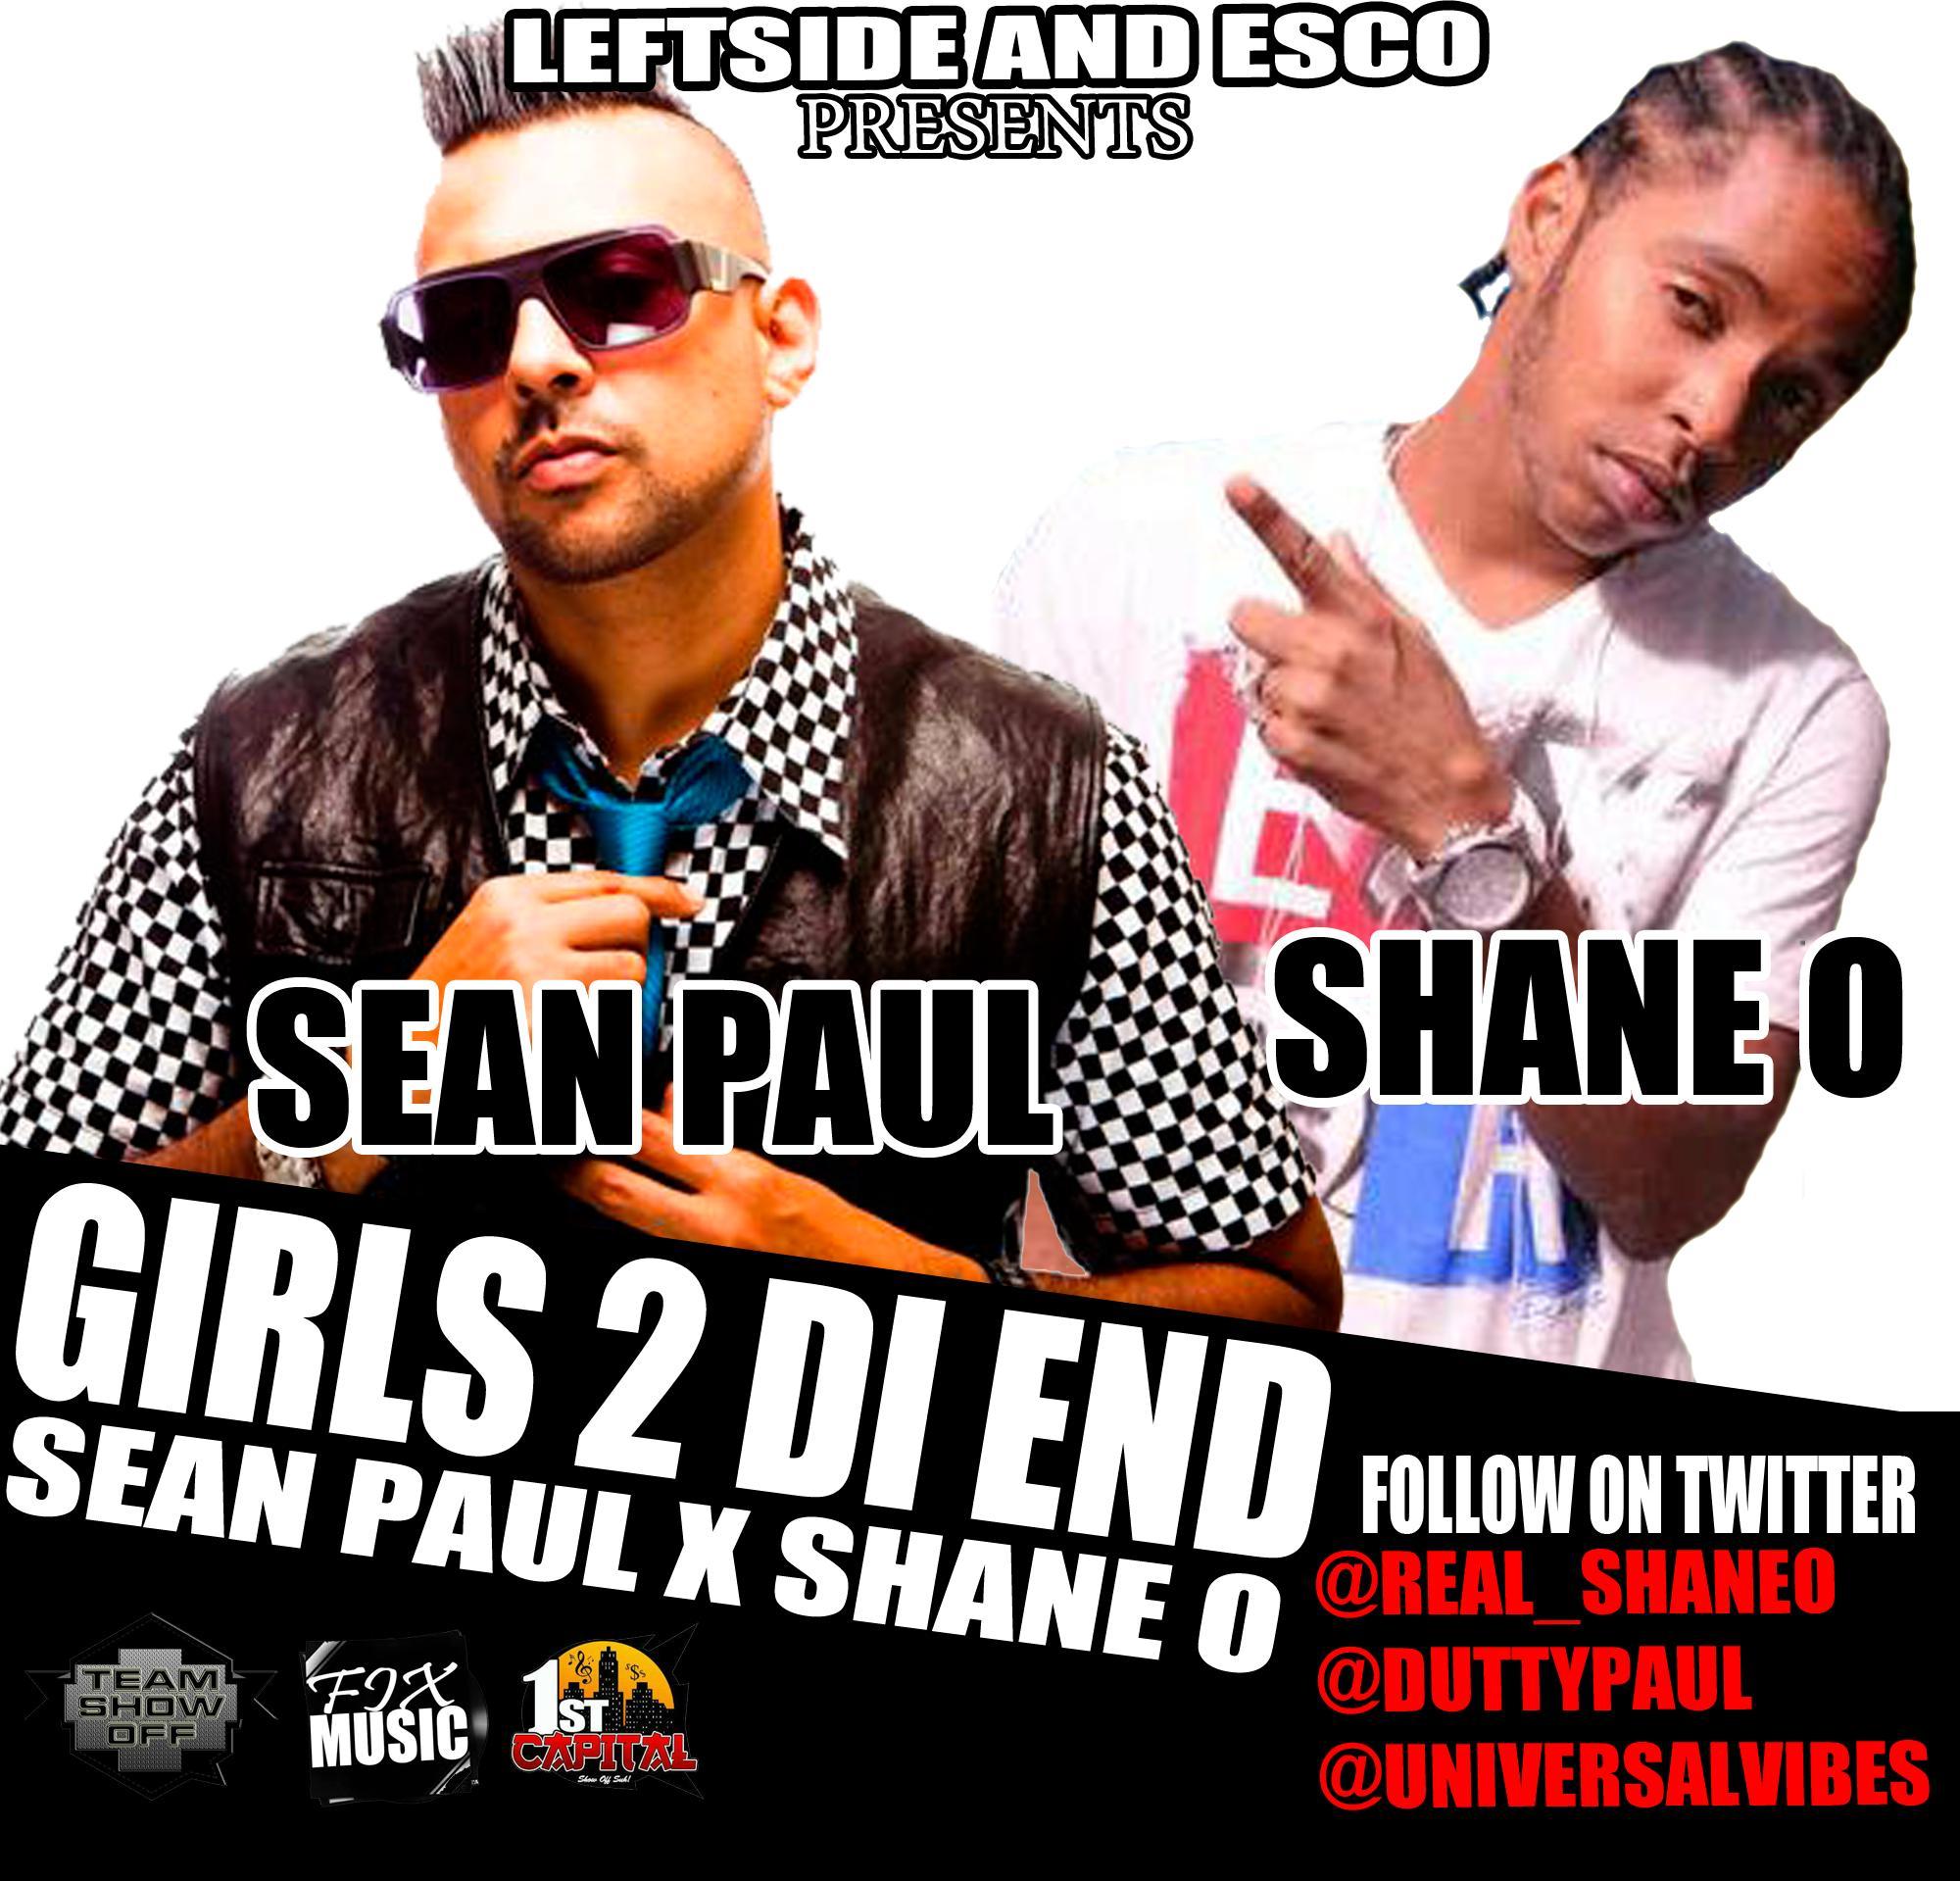 SEAN PAUL FT SHANE O – GIRLS 2 DI END – LEFTSIDE AND ESCO